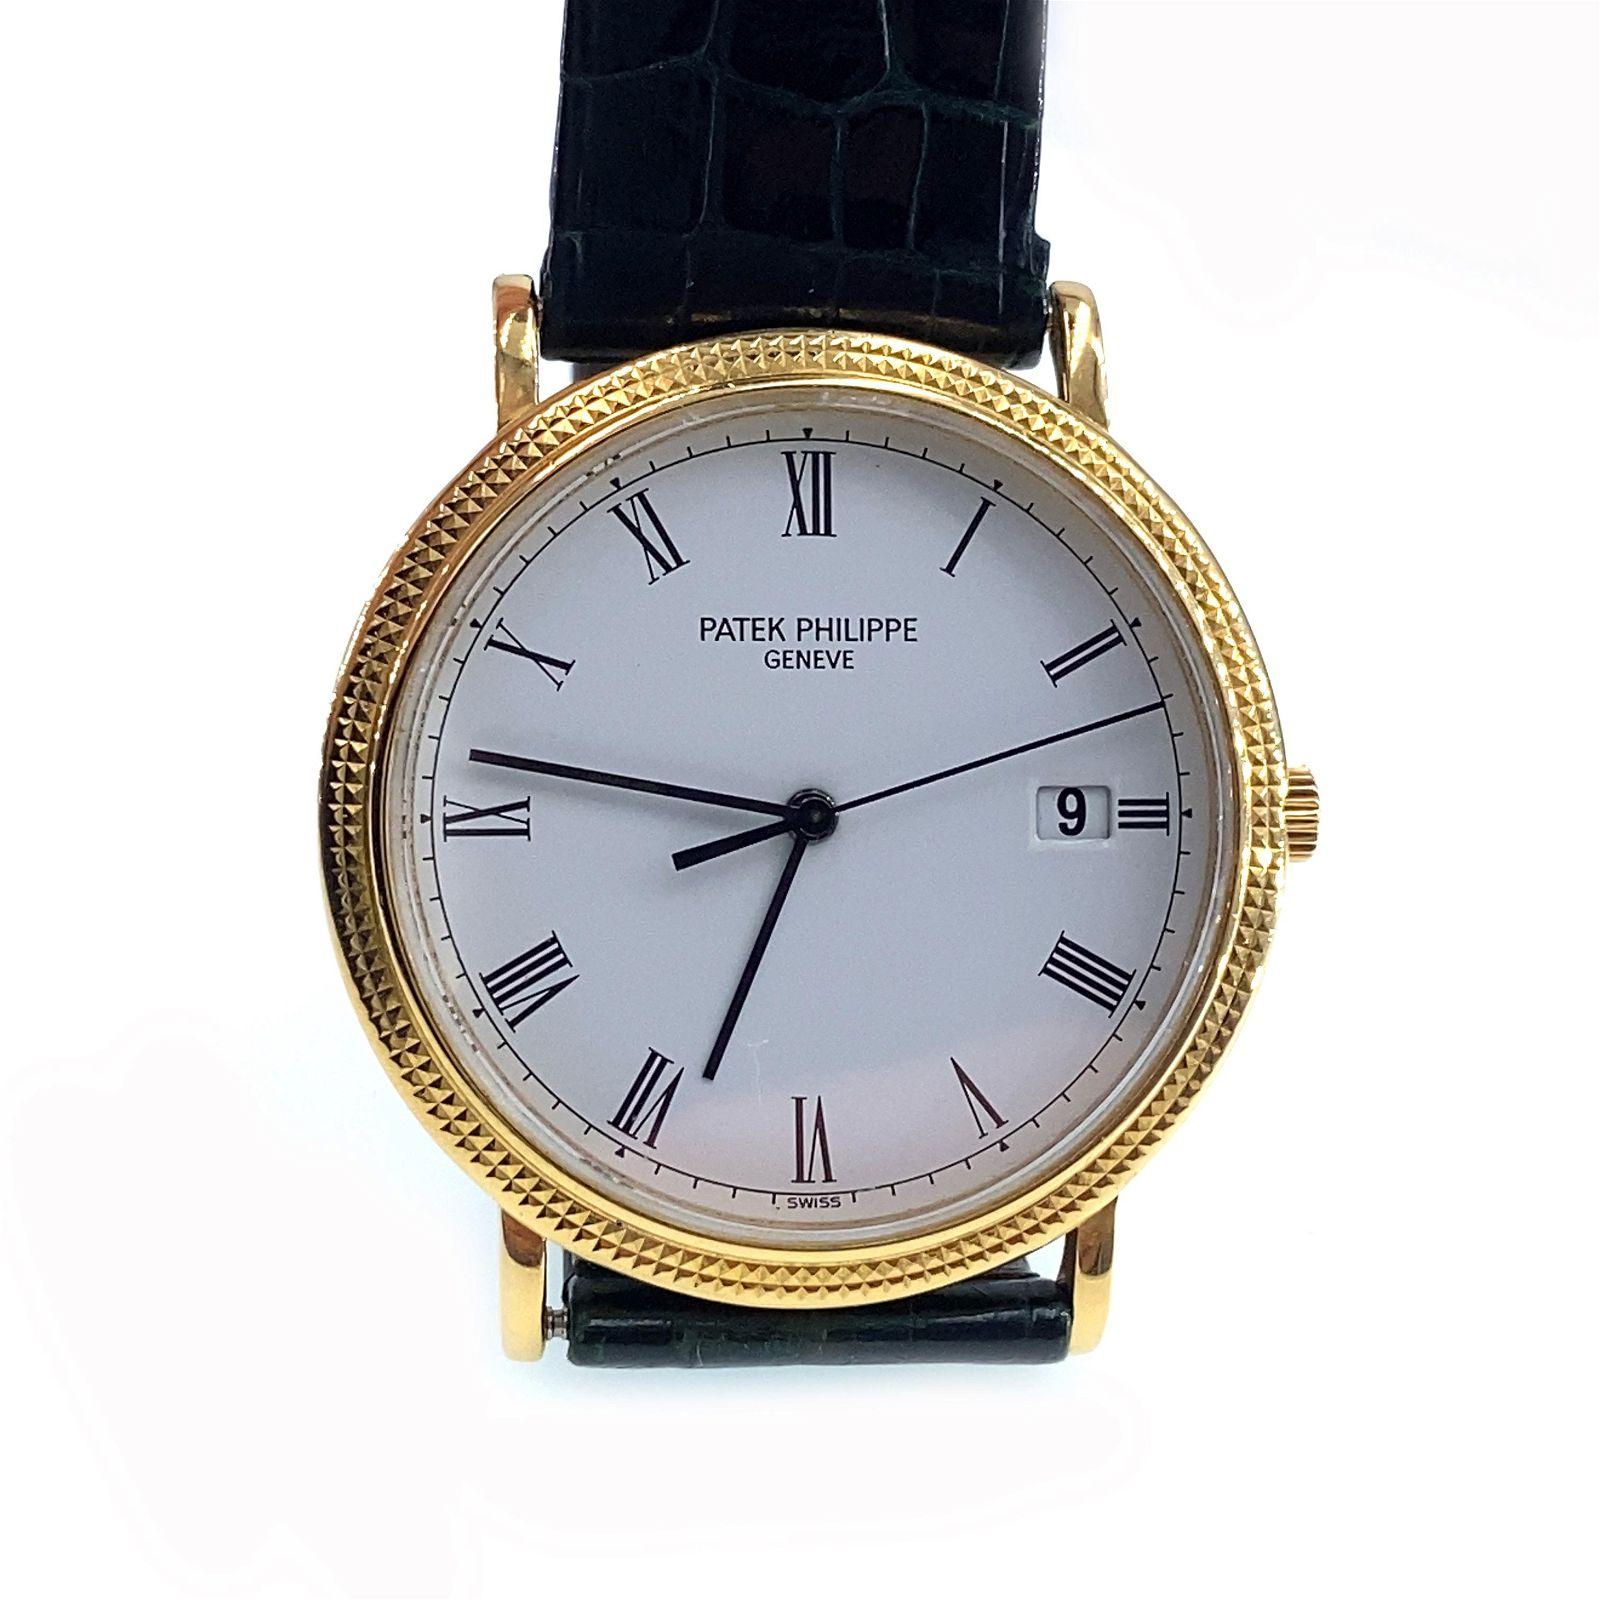 PATEK PHILIPPE Calatrava 18k gold Quartz wristwatch